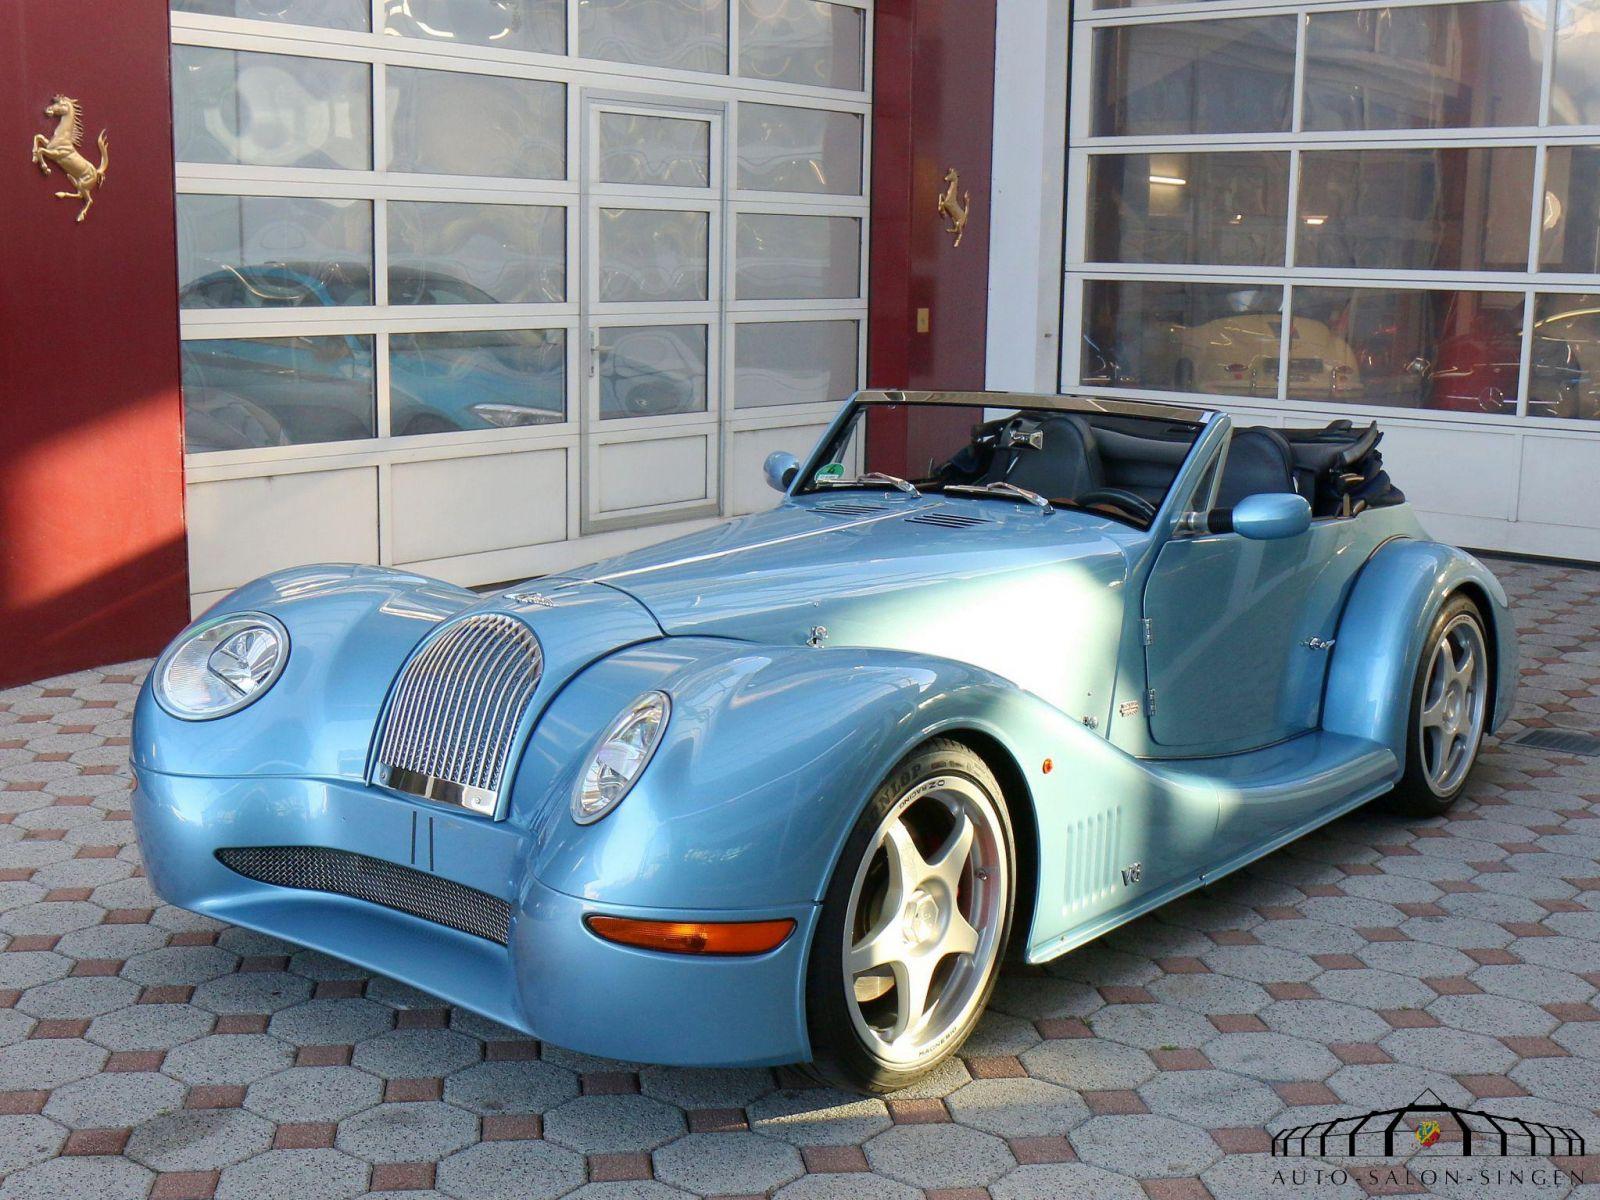 Morgan Auto Salon Singen